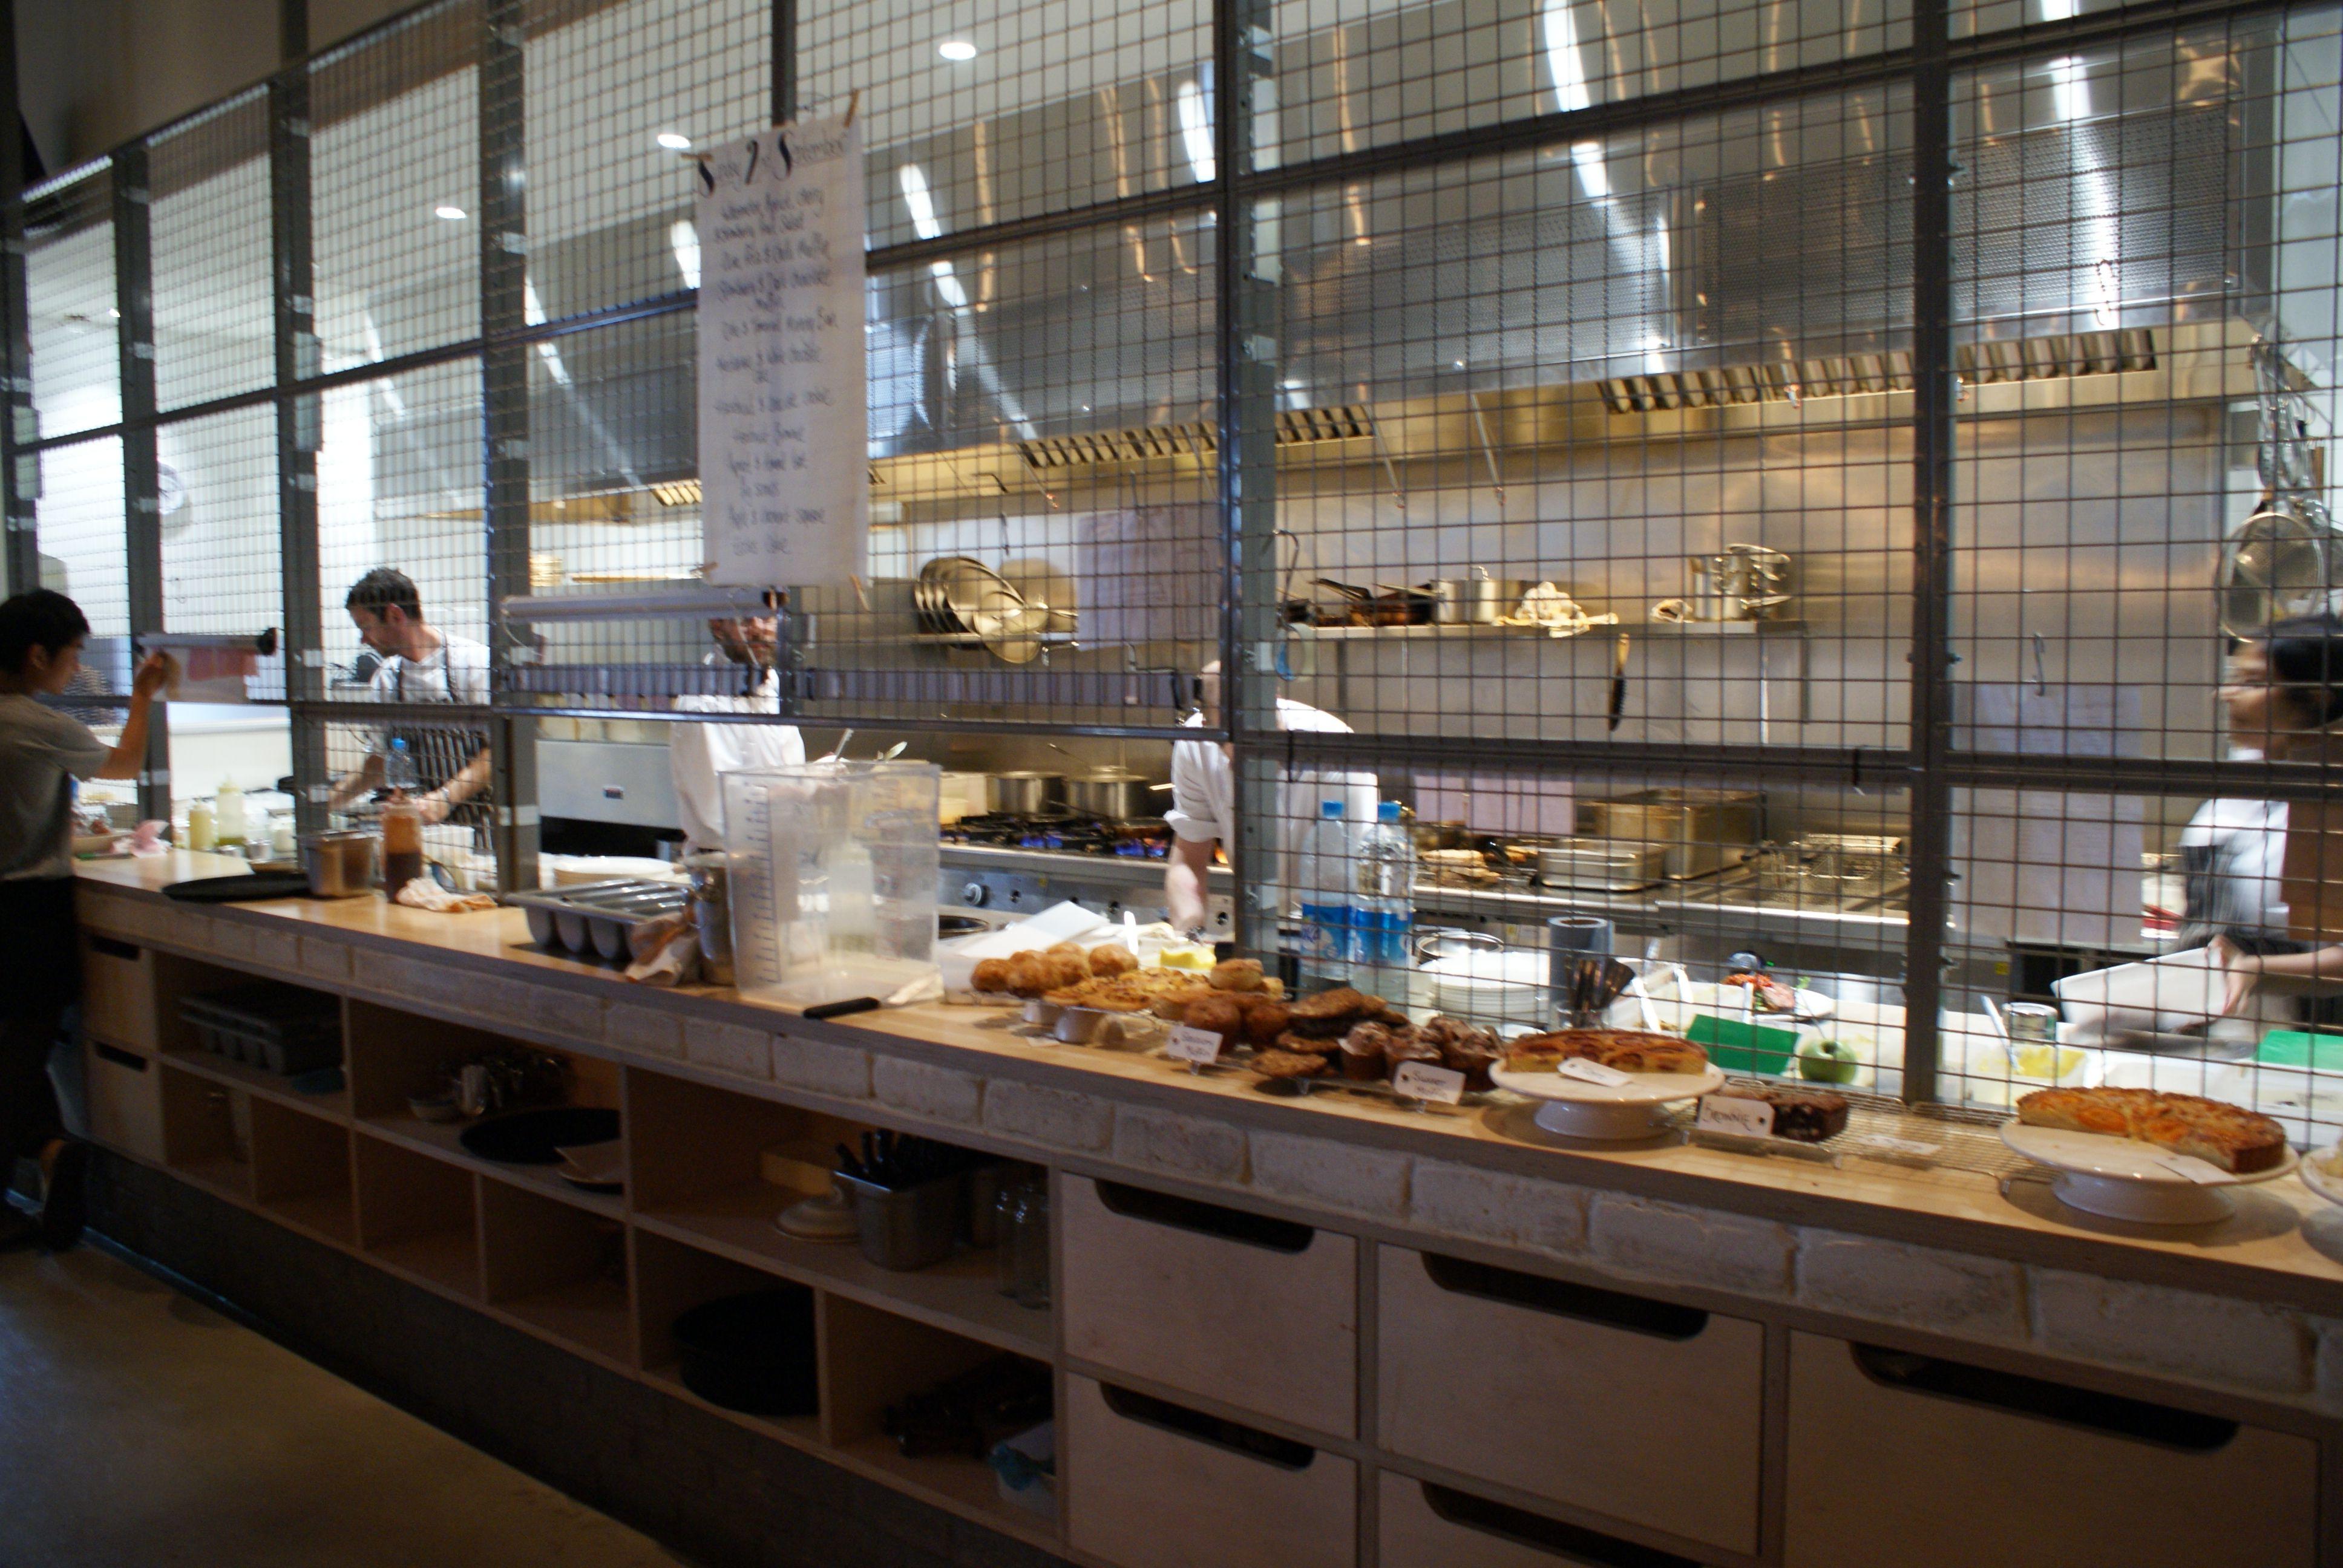 kitchen view option 부엌 디자인 레스토랑 디자인 인테리어 on kitchen interior top view id=59542